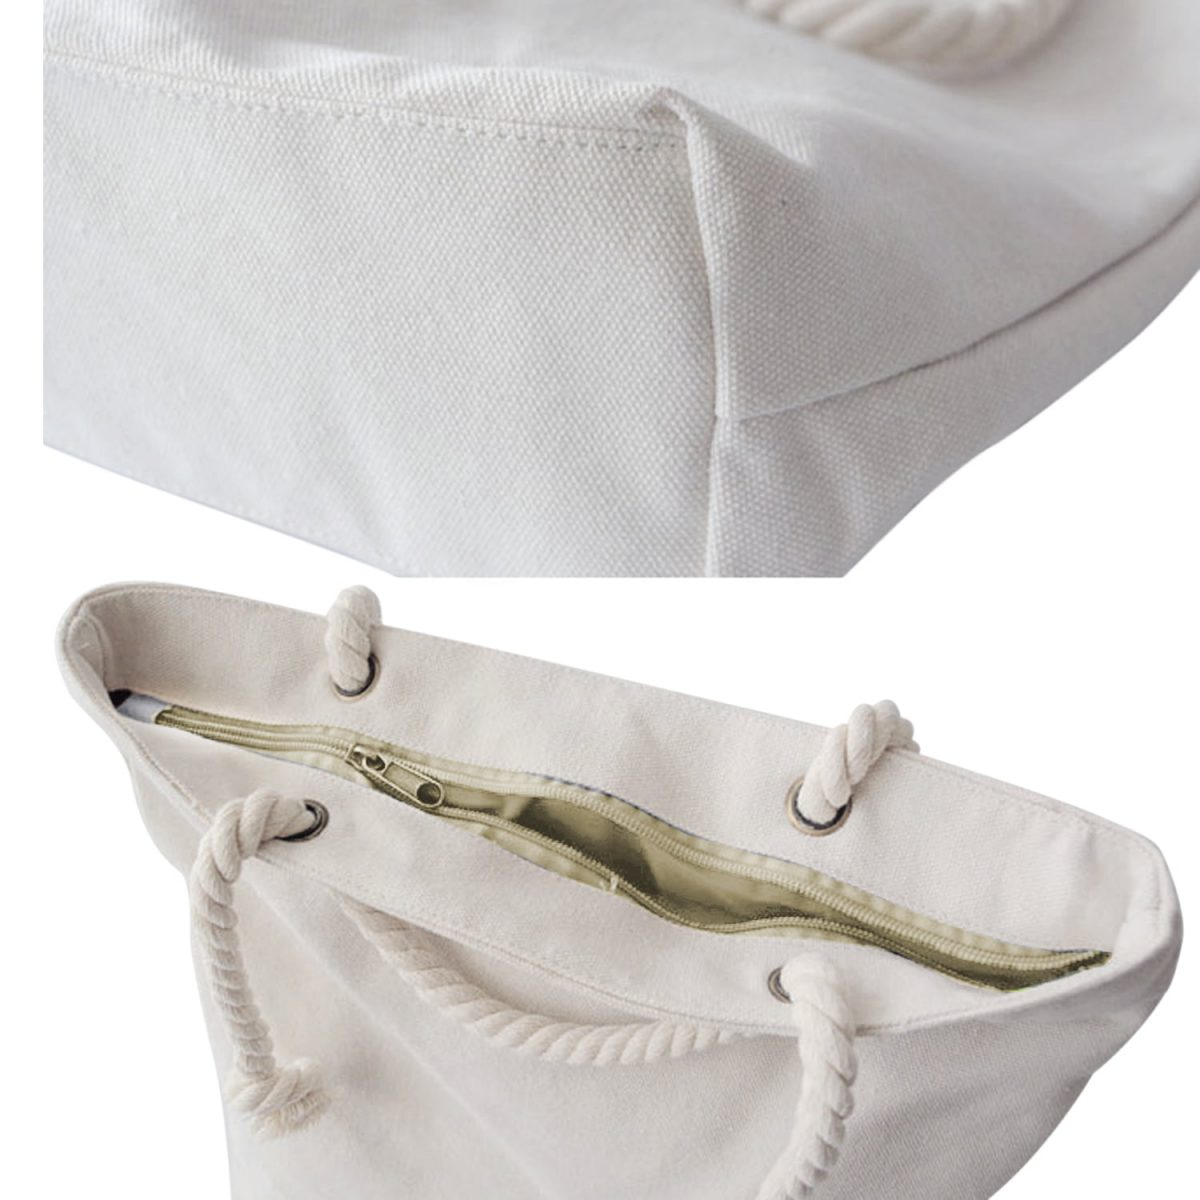 Kara Zigzag Desenli Ogea Motifli Fermuarlı Modern Kumaş Çanta Realhomes